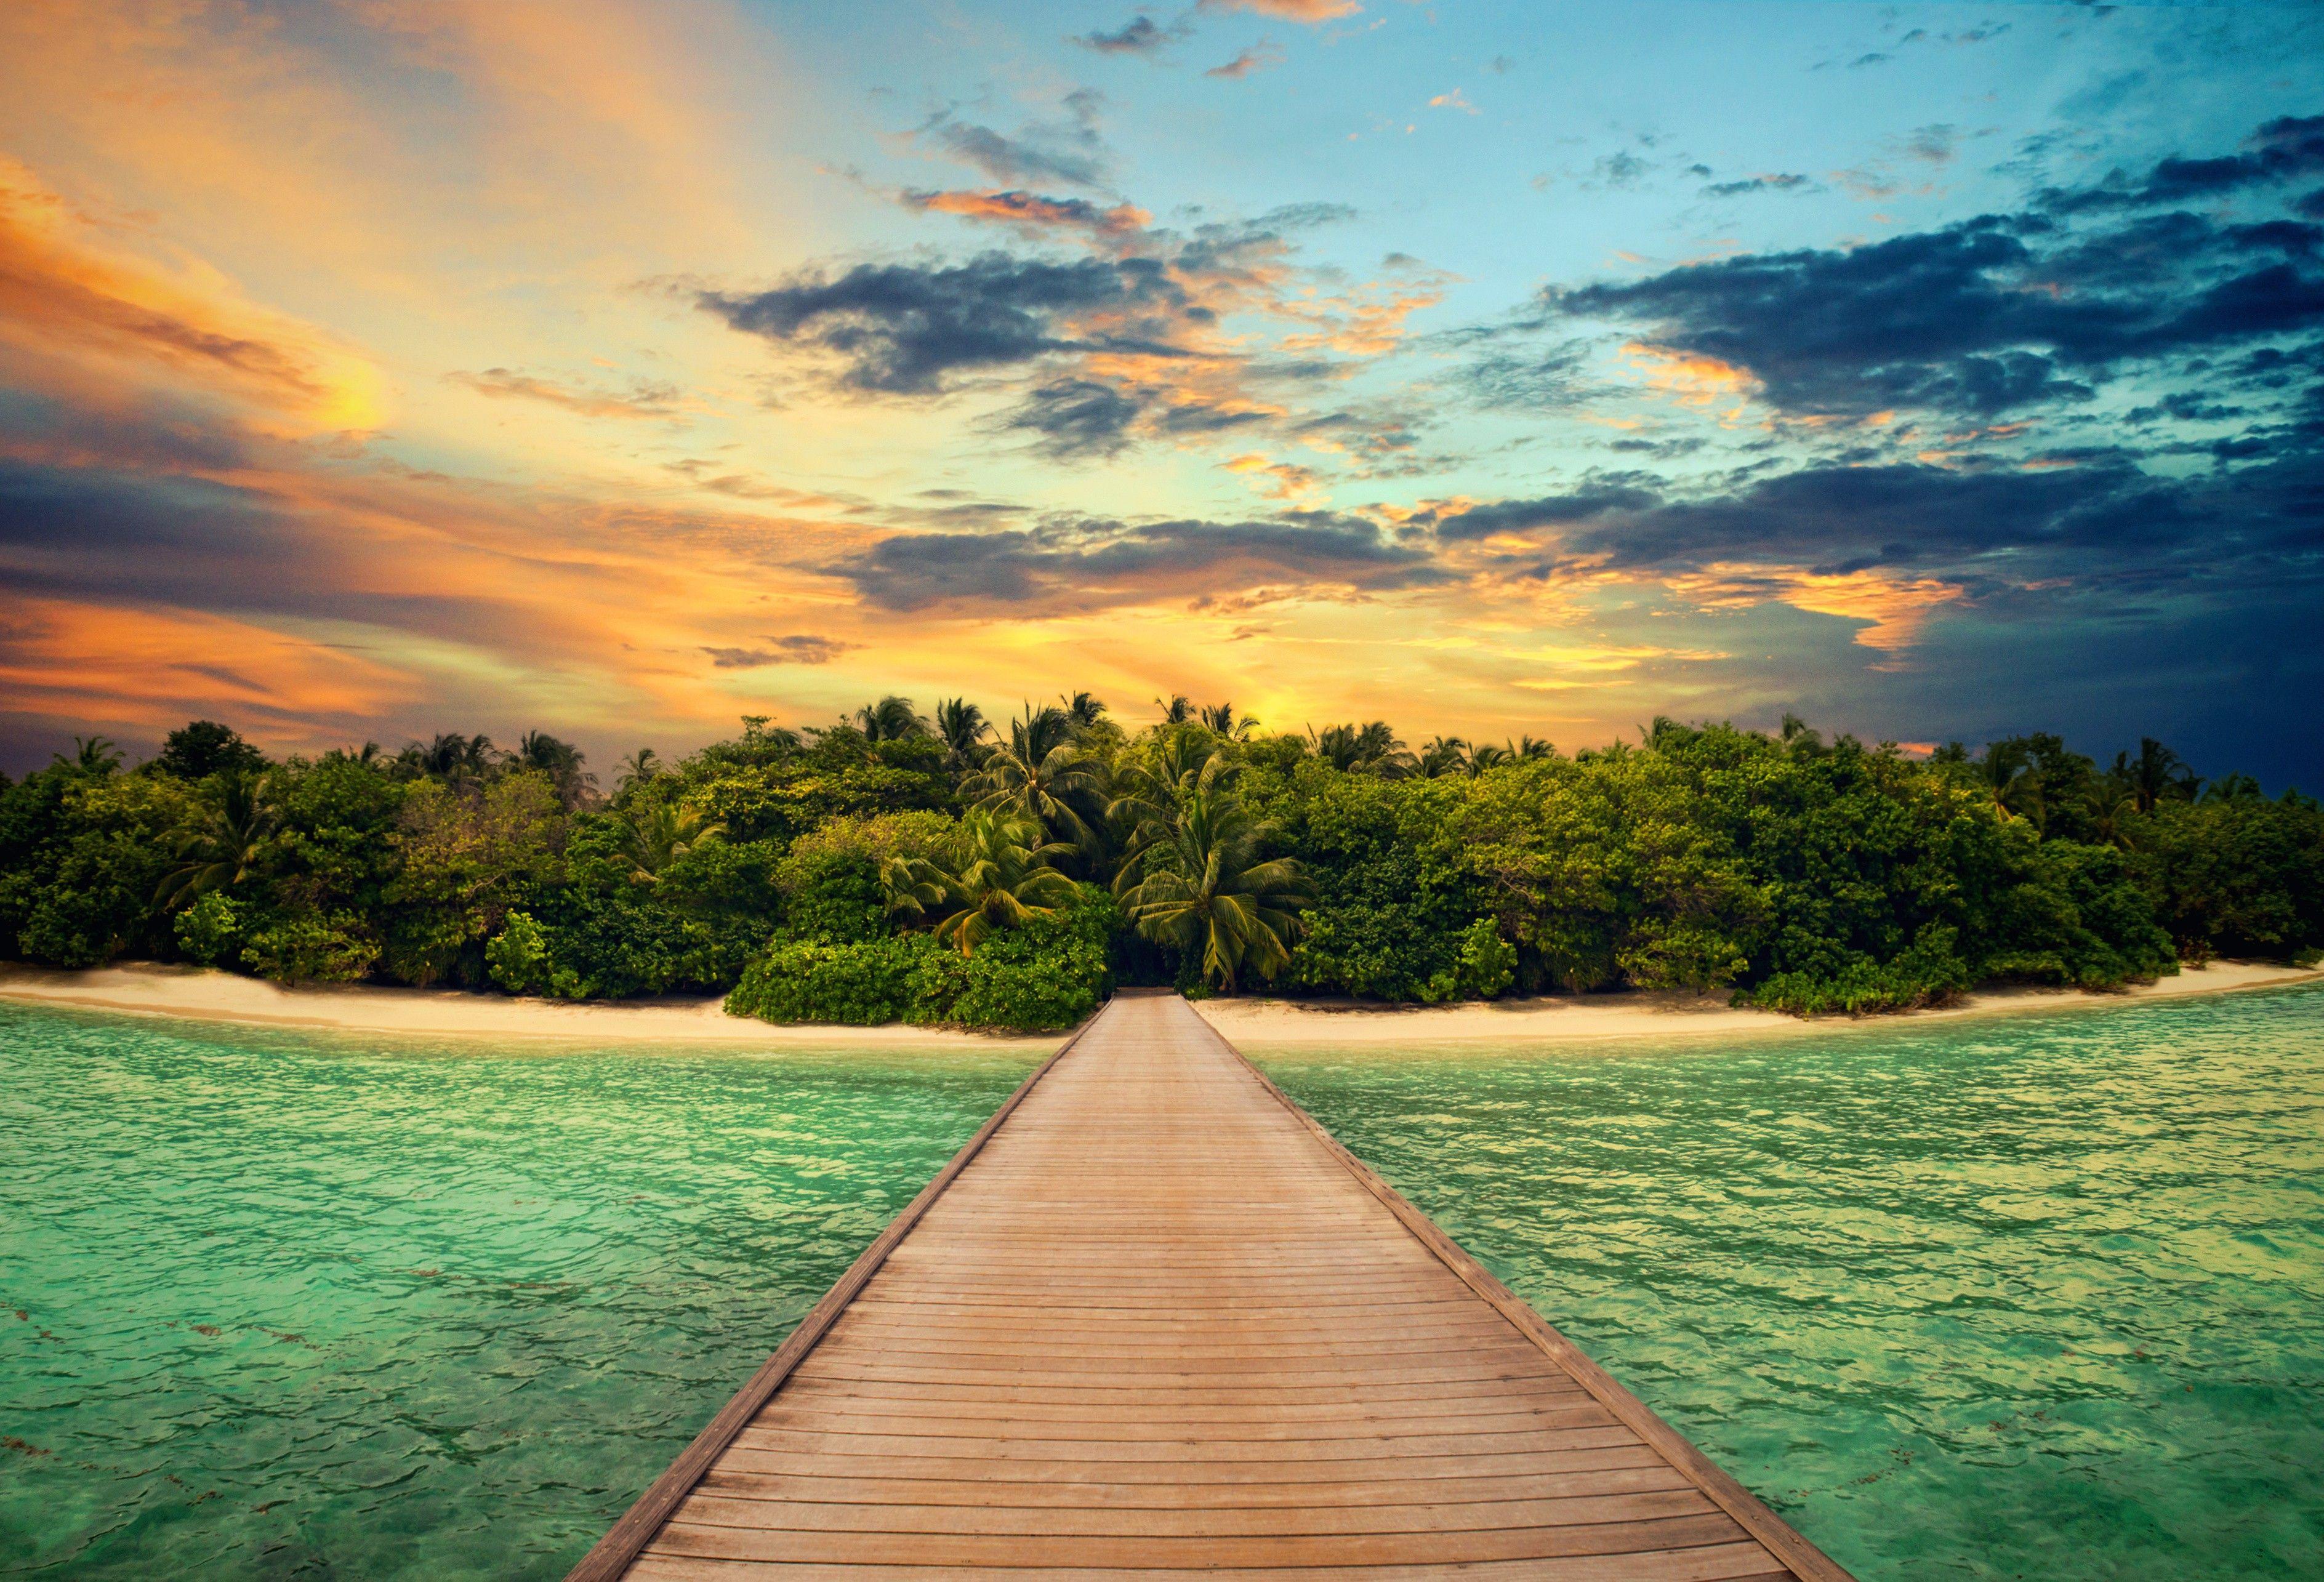 Landscape Nature Scenery Wallpaper - Full Hd Beautiful Nature , HD Wallpaper & Backgrounds